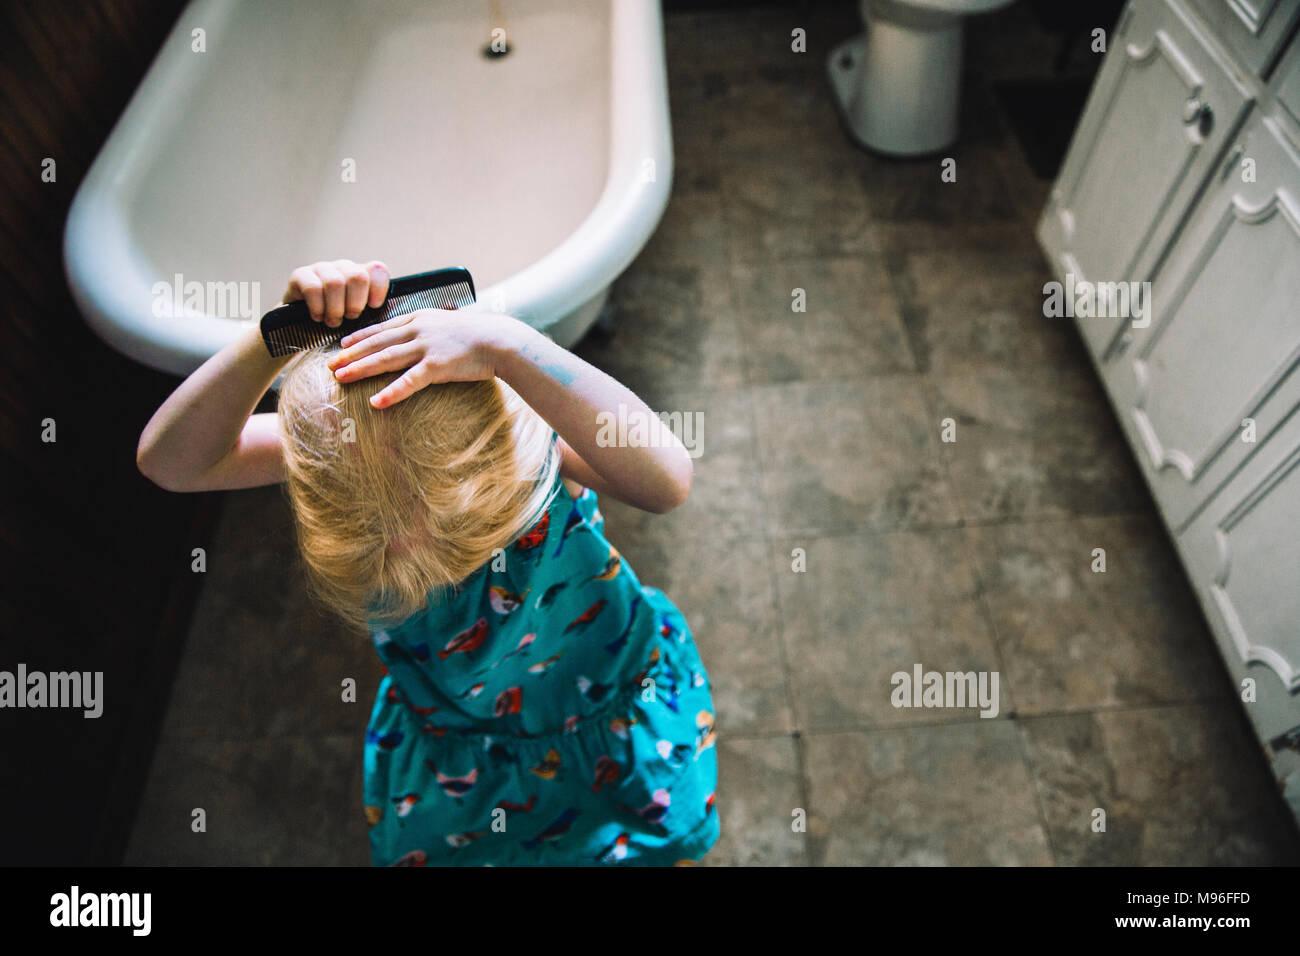 Girl combing her hair Stock Photo